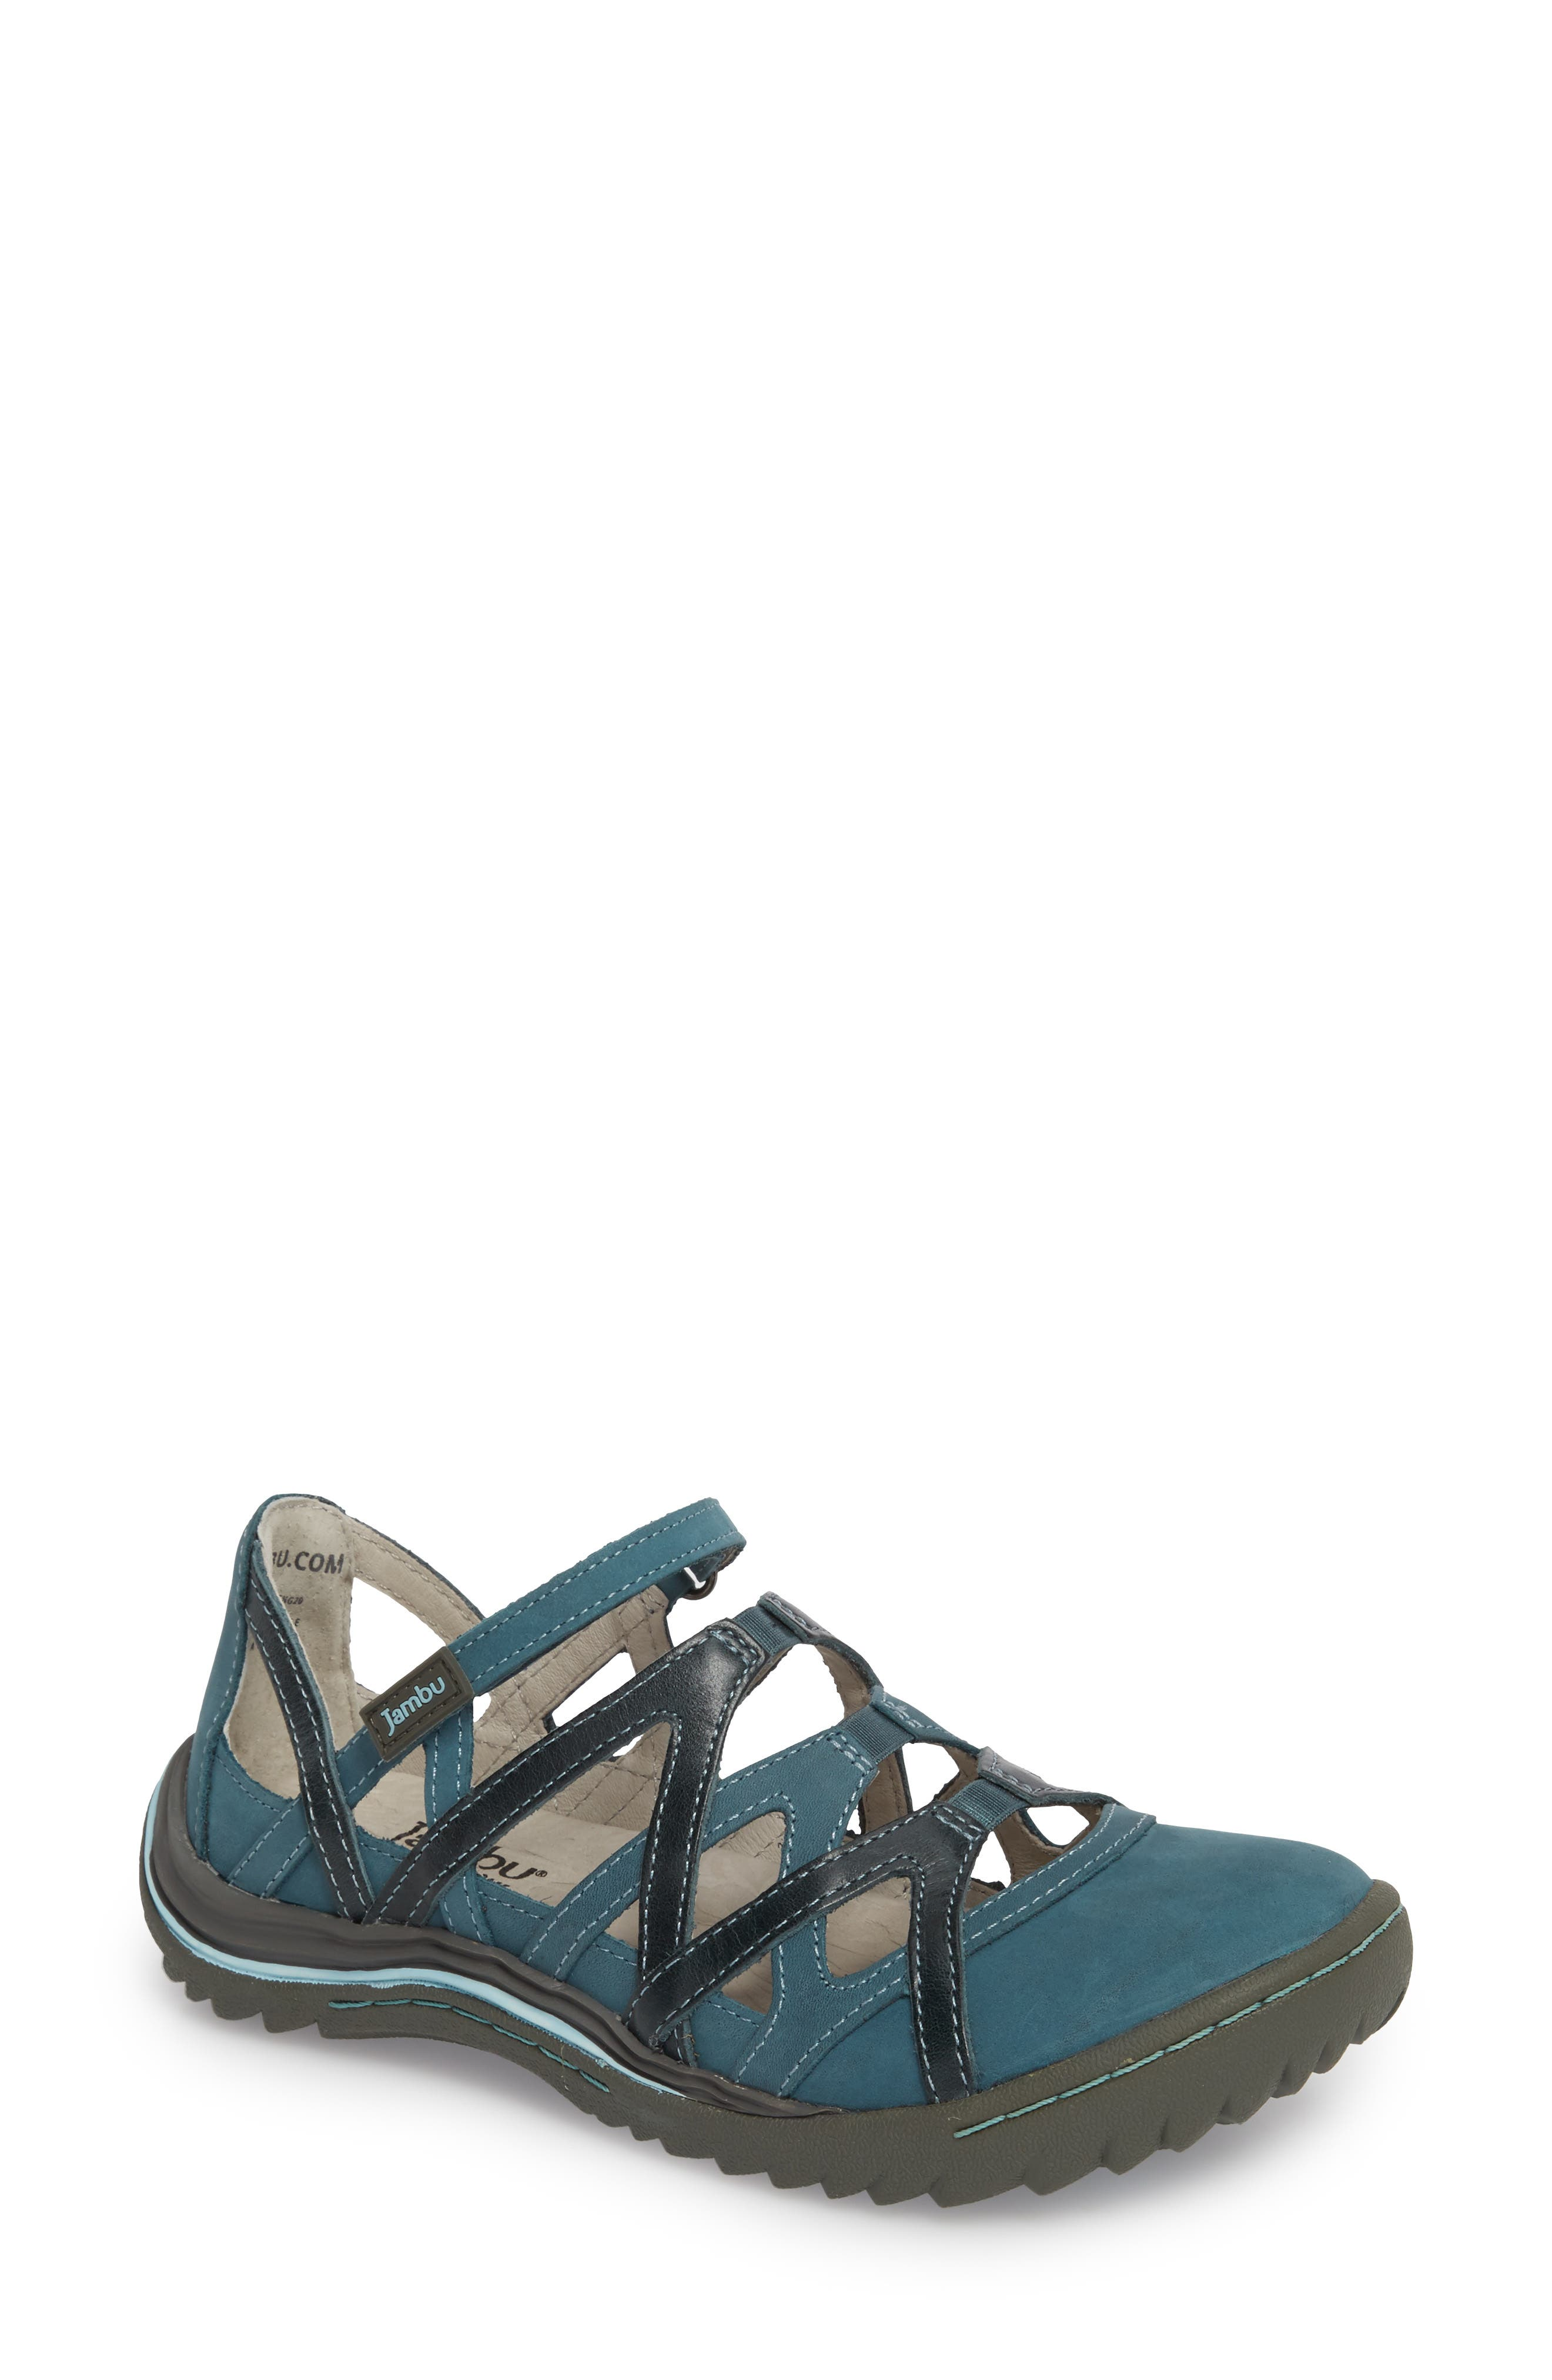 Jambu Tangerine Gladiator Sport Sandal- Blue/green